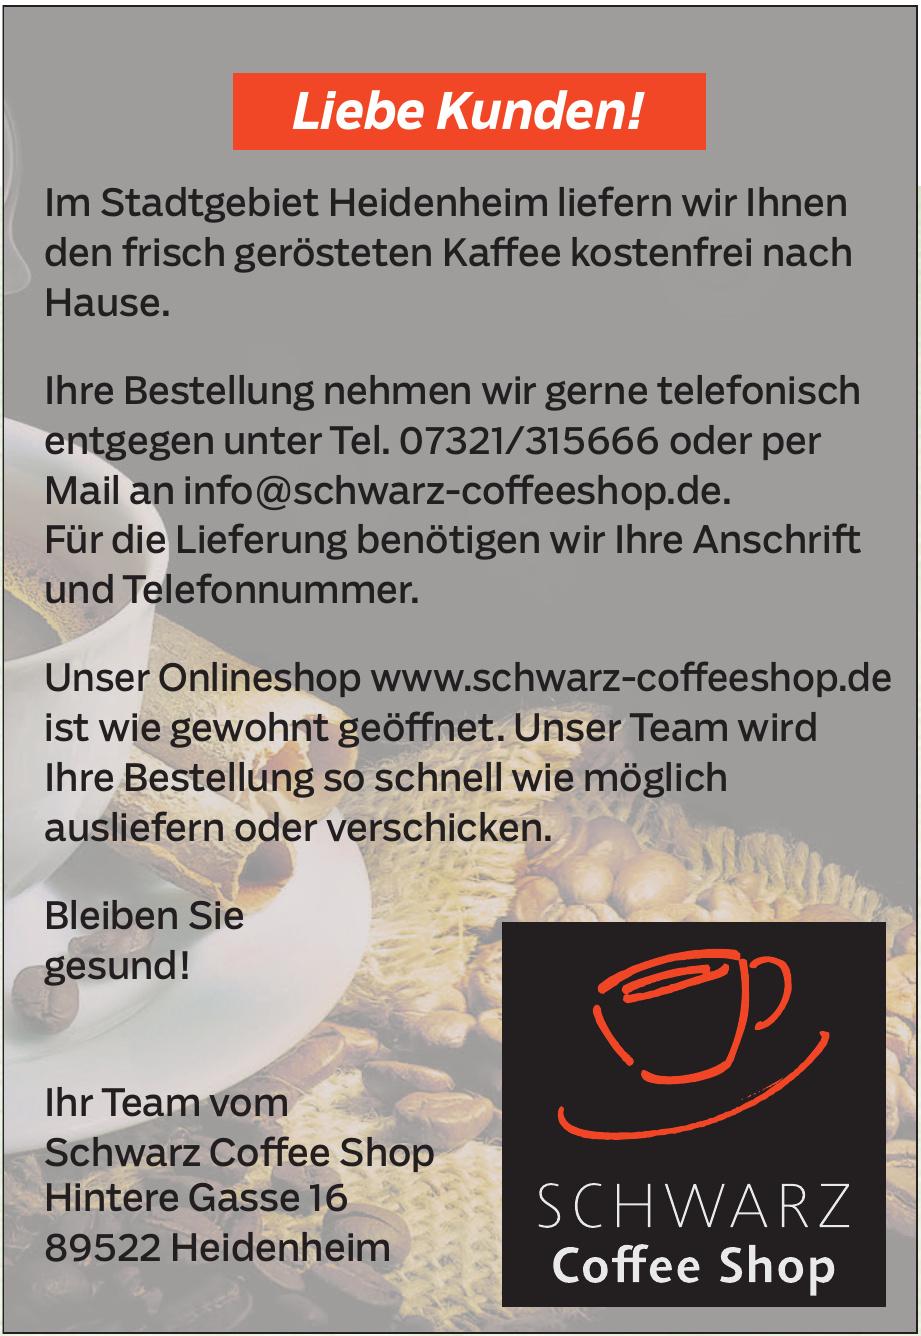 Schwarz Coffee Shop